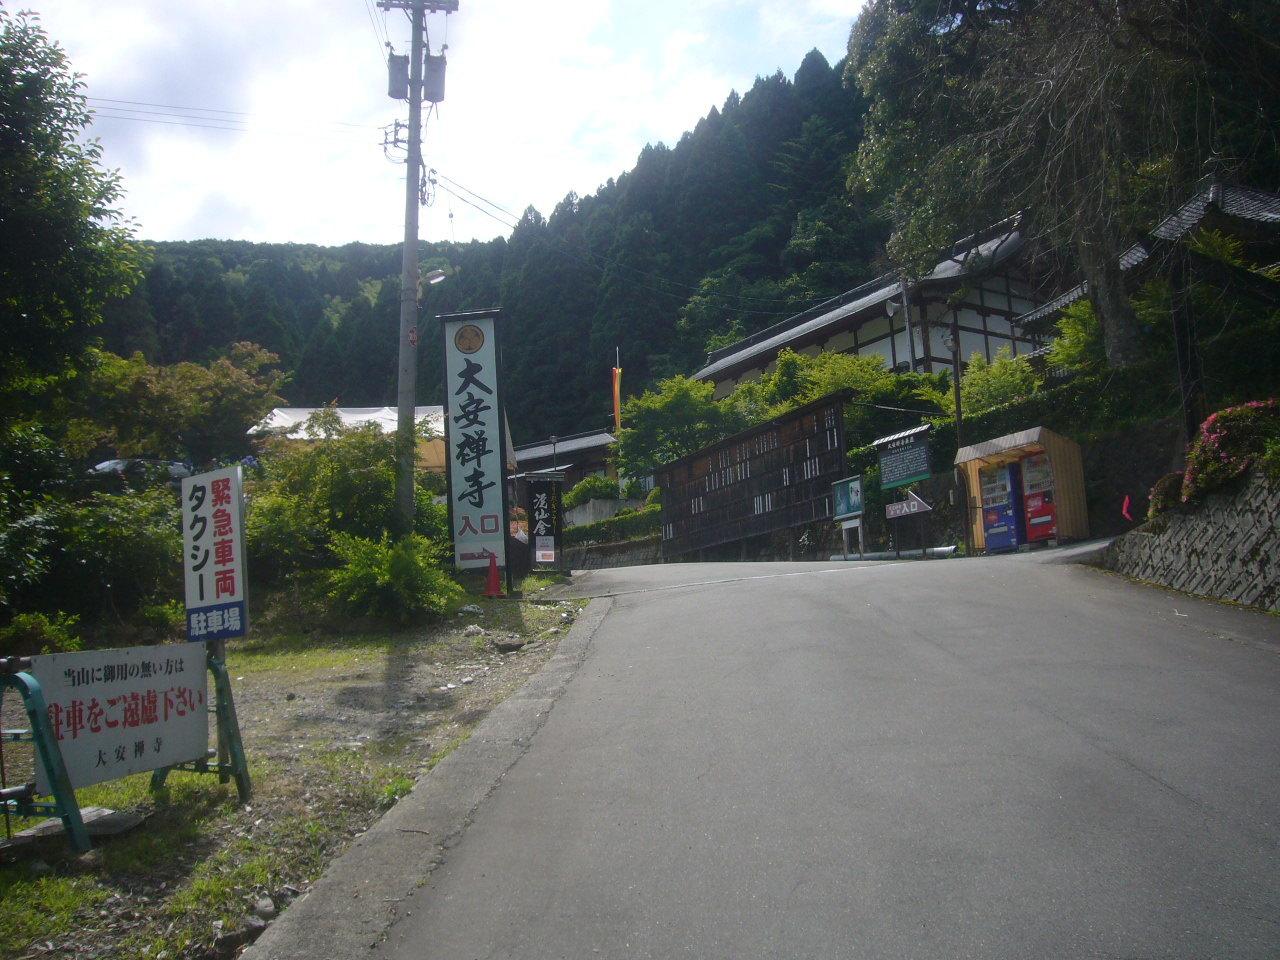 大安禅寺 菖蒲祭り H29.6.13